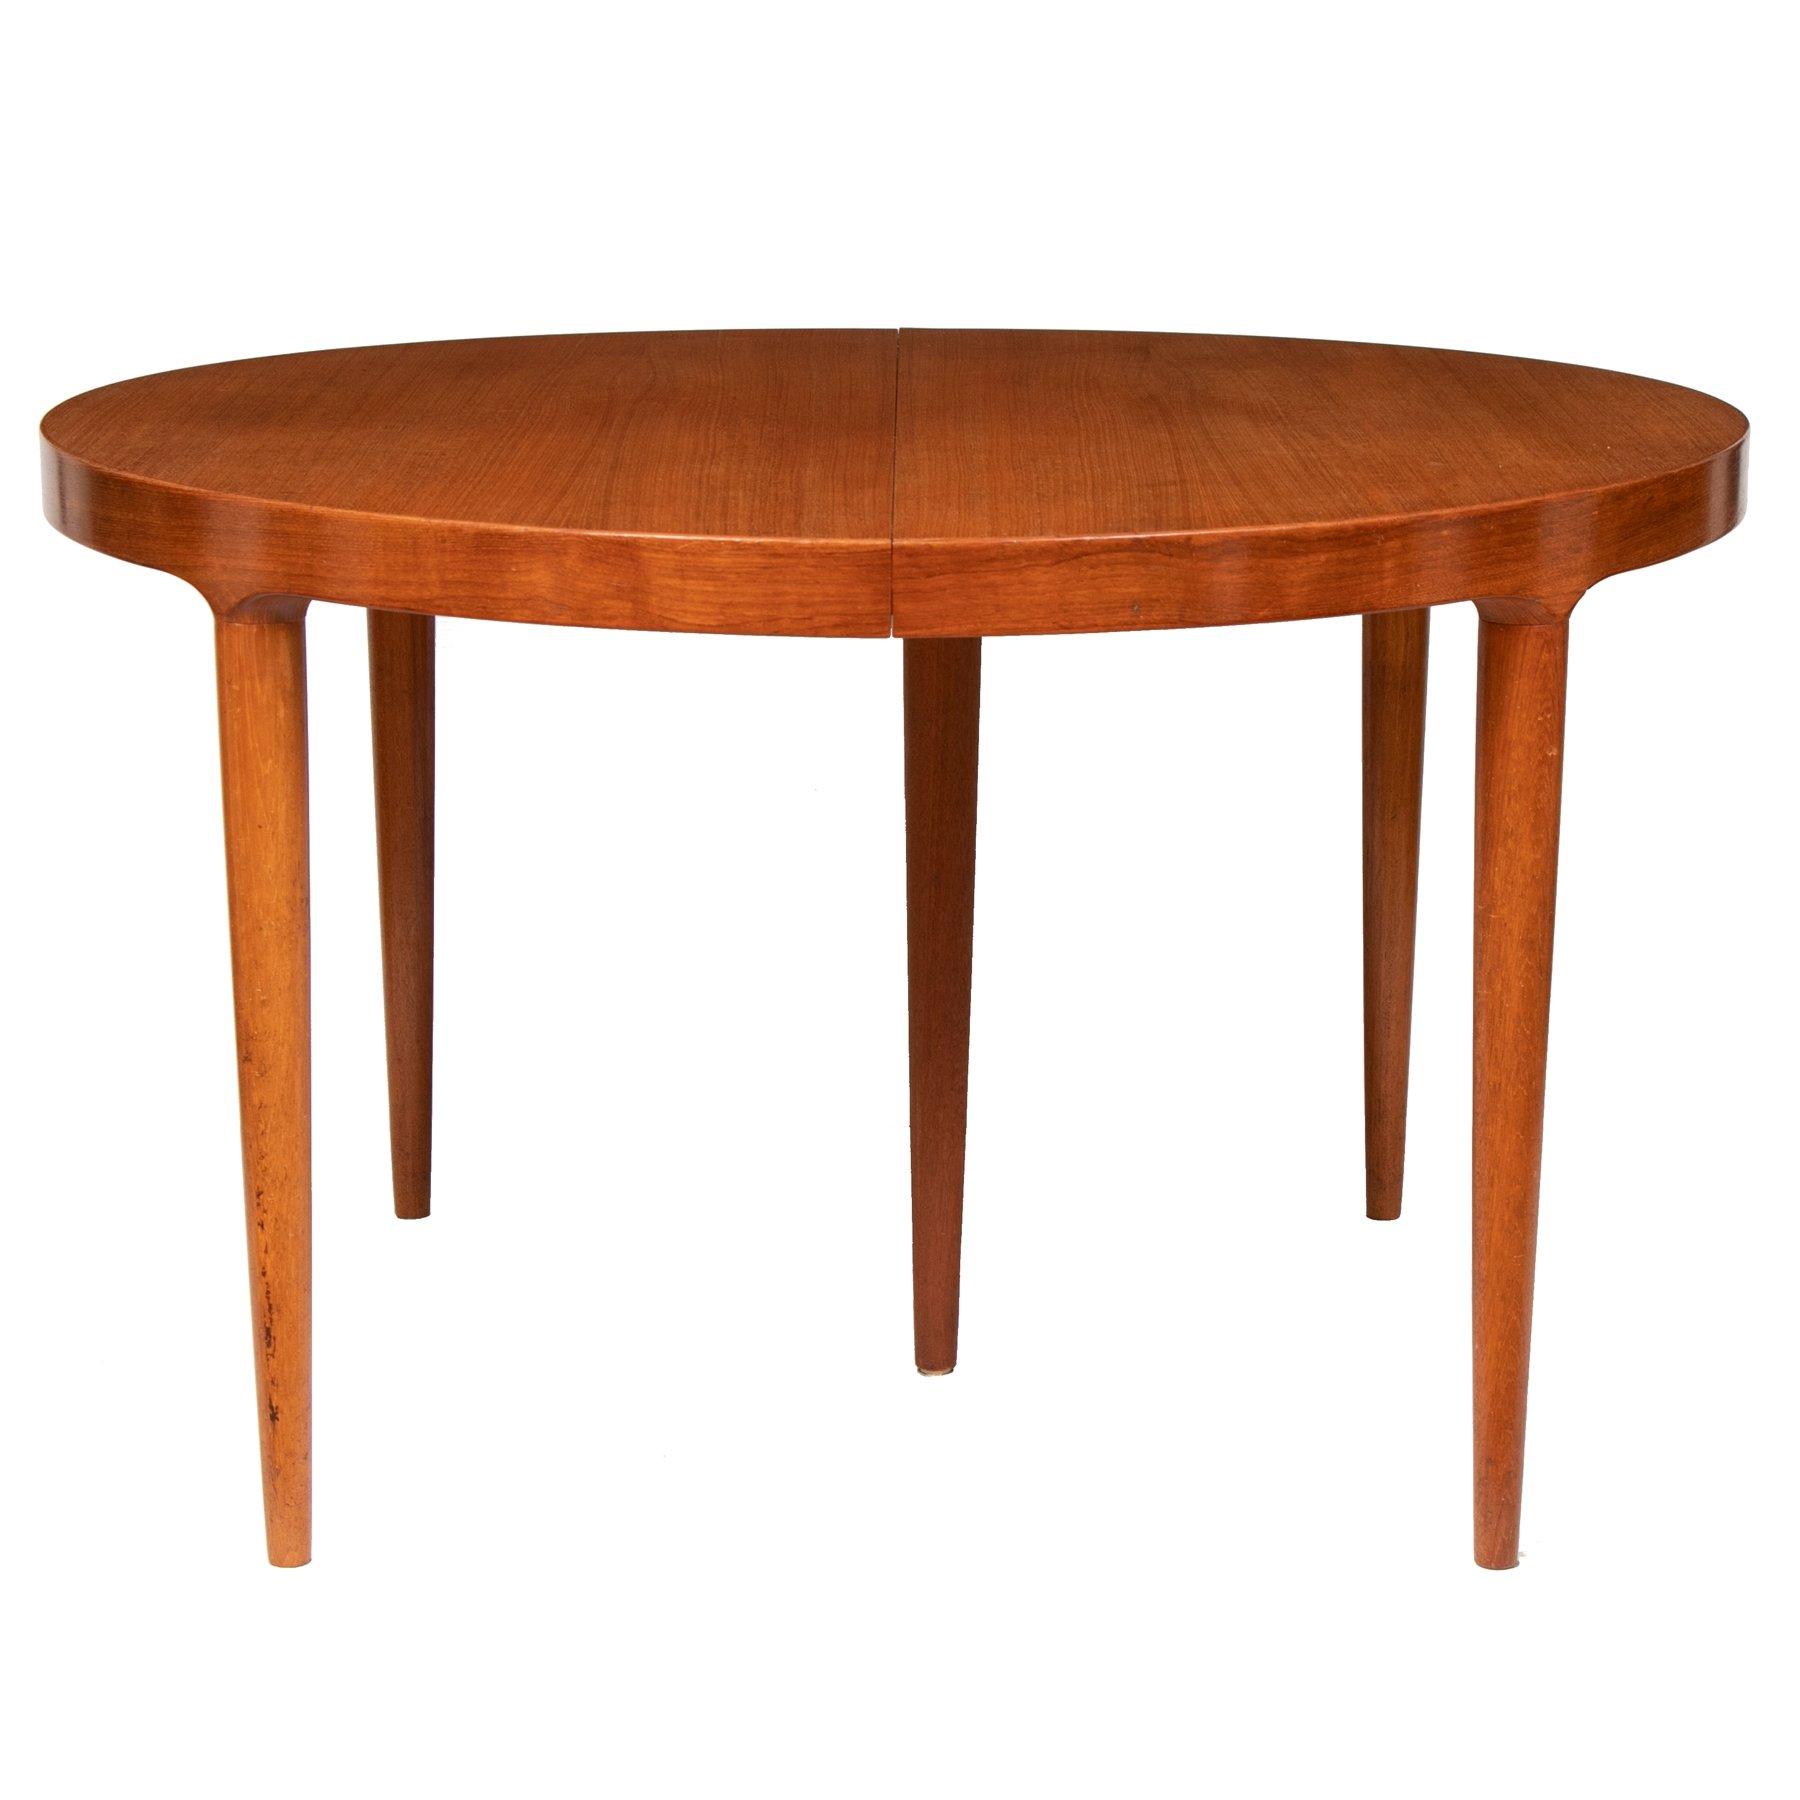 Danish Midcentury Teak Extending Dining Table C 1960 135041